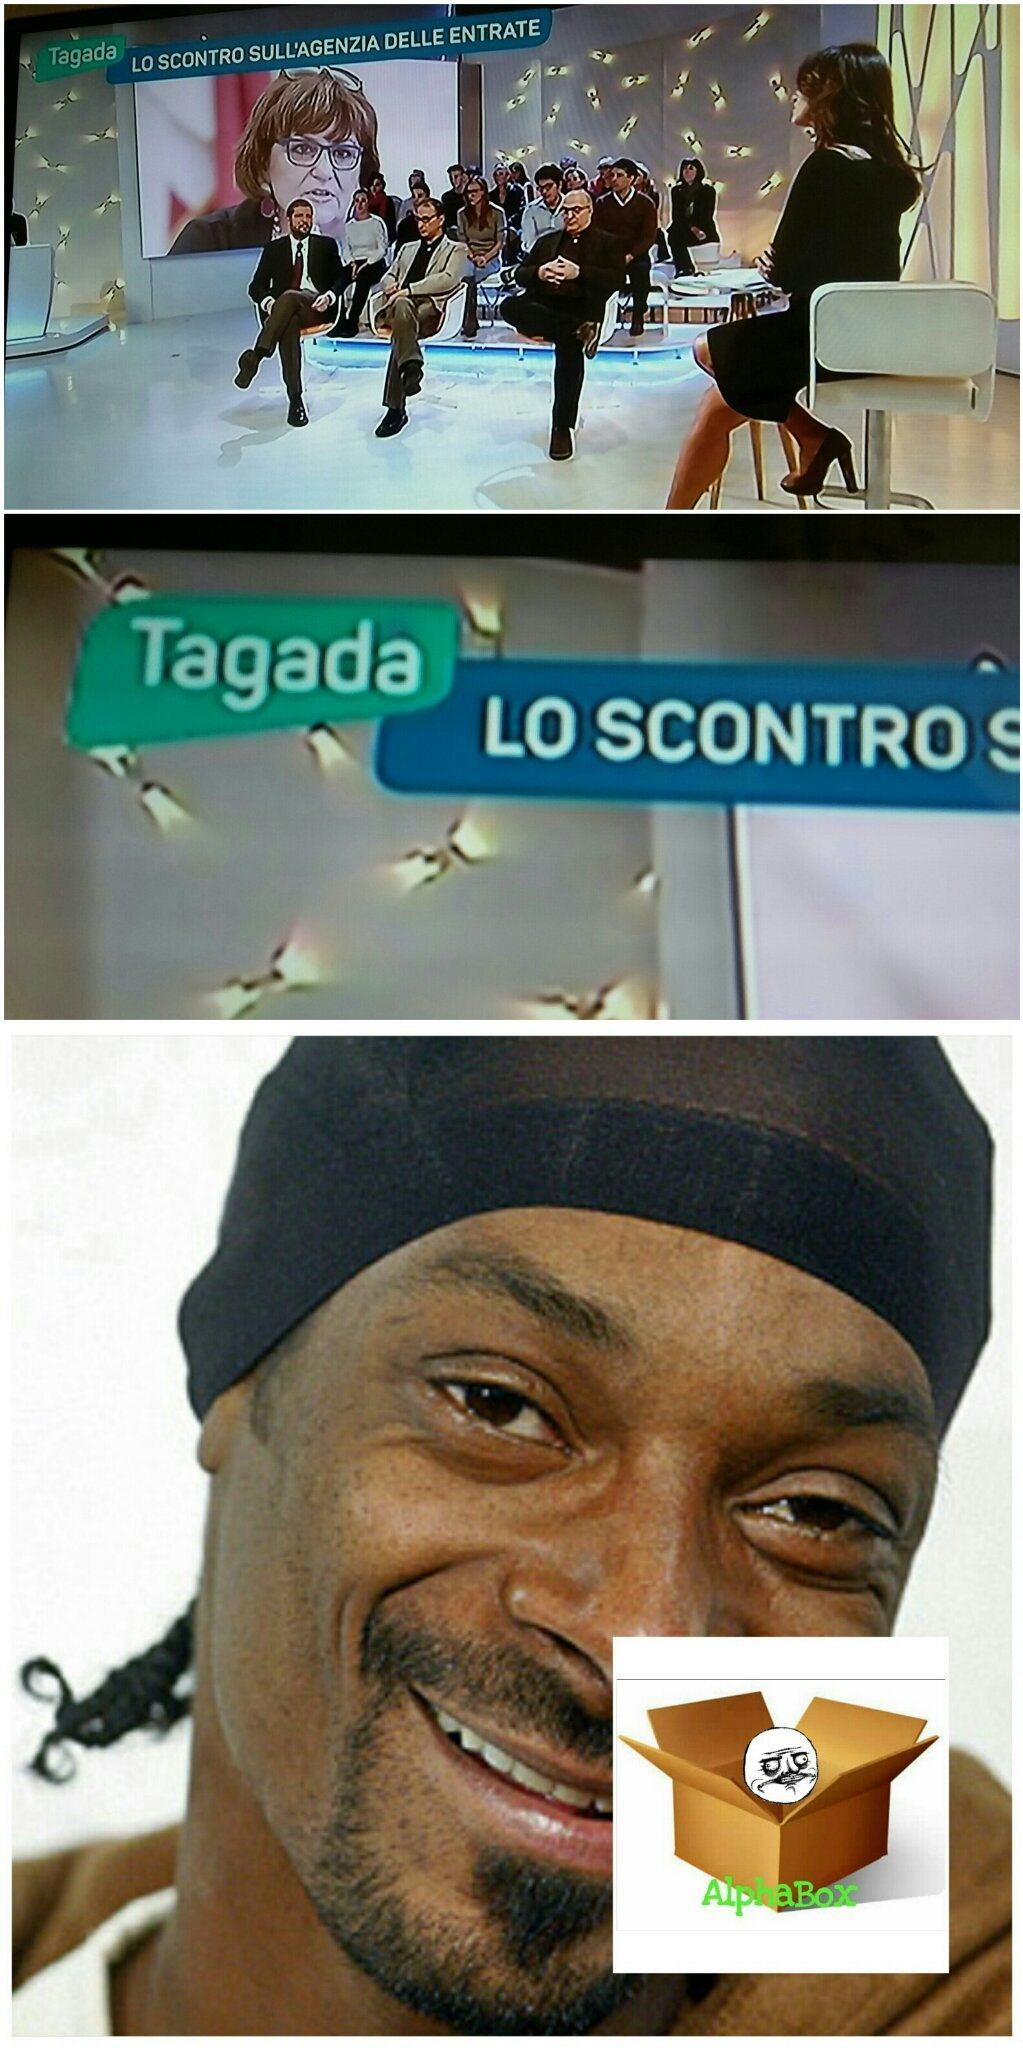 Tagadagadá - meme